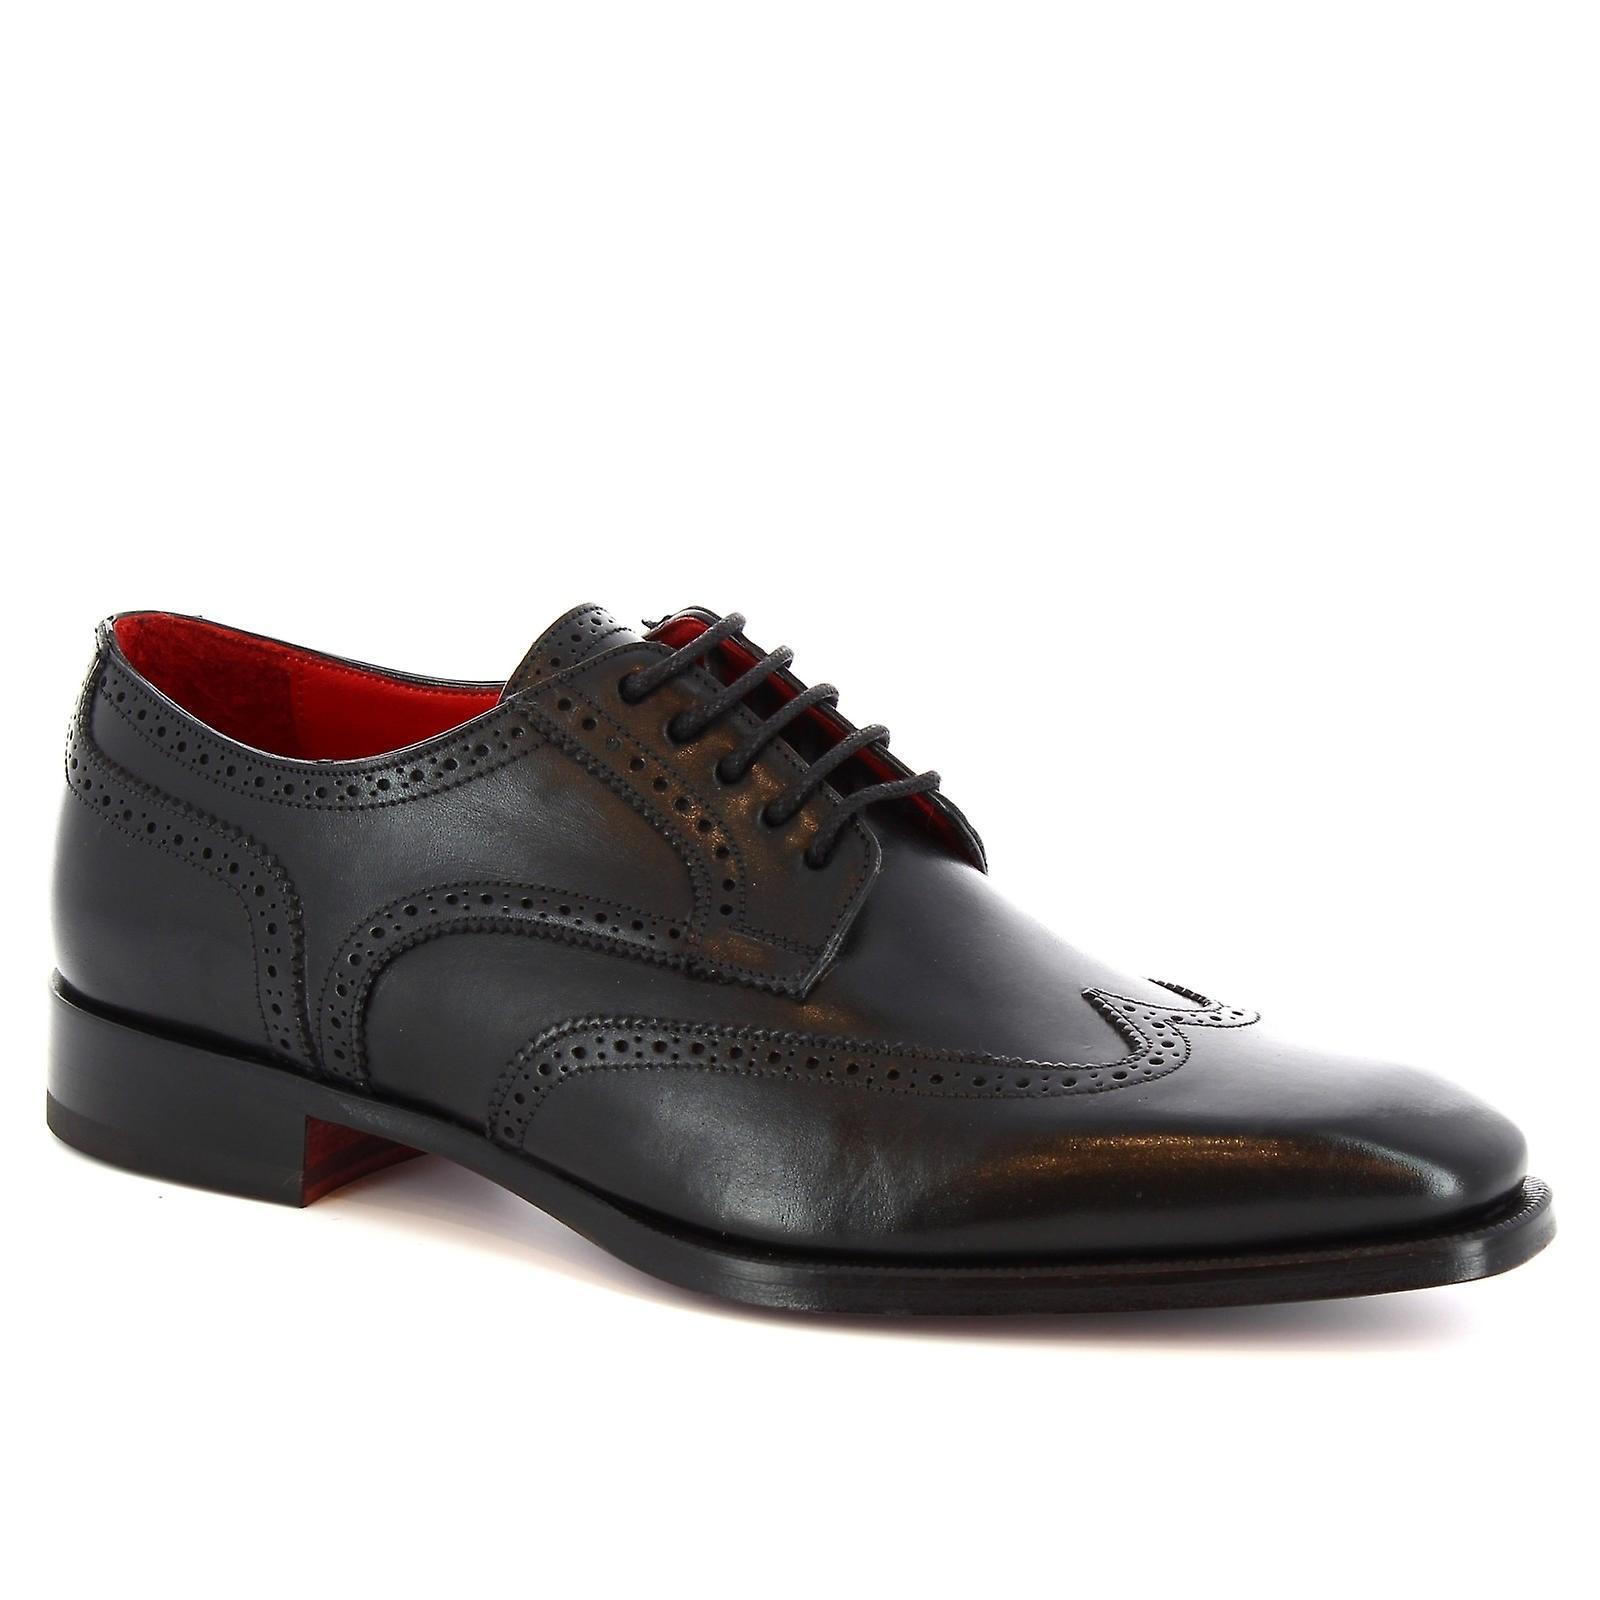 Leonardo Shoes Men's handmade Wingtip Oxford Brogues in black calf leather